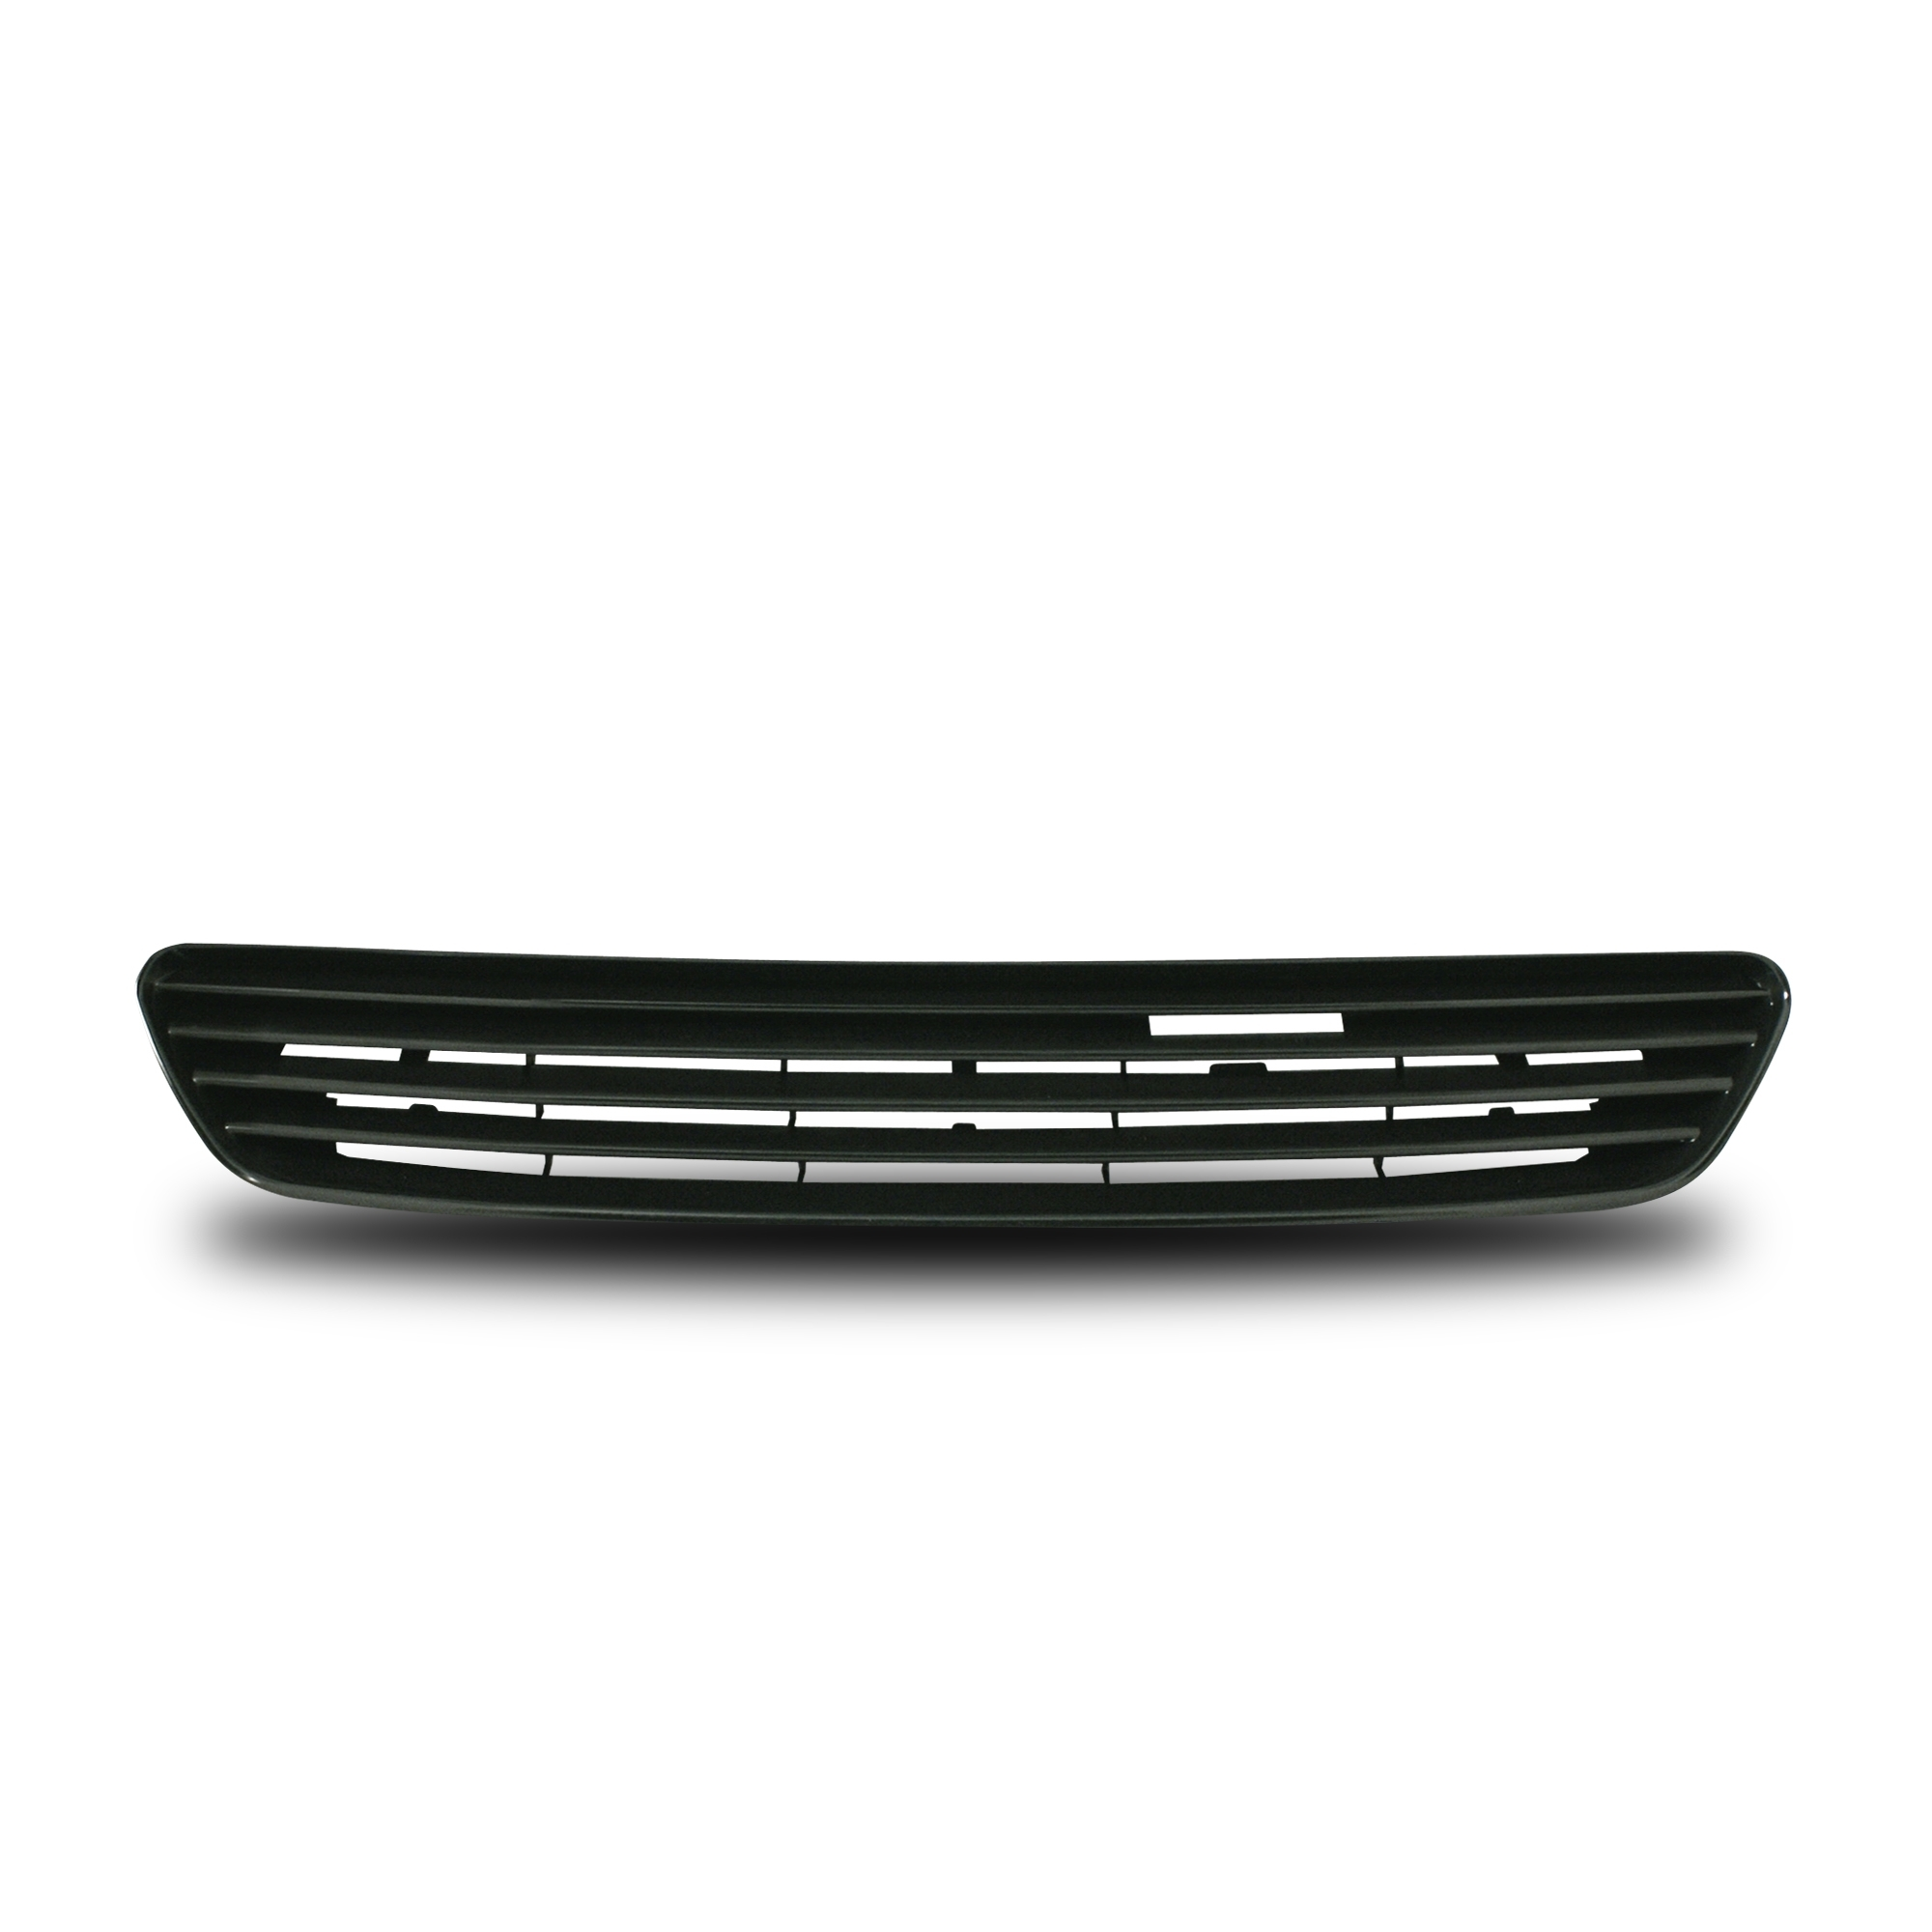 JOM Frontgrill sort til Opel Astra G - uden logo Styling